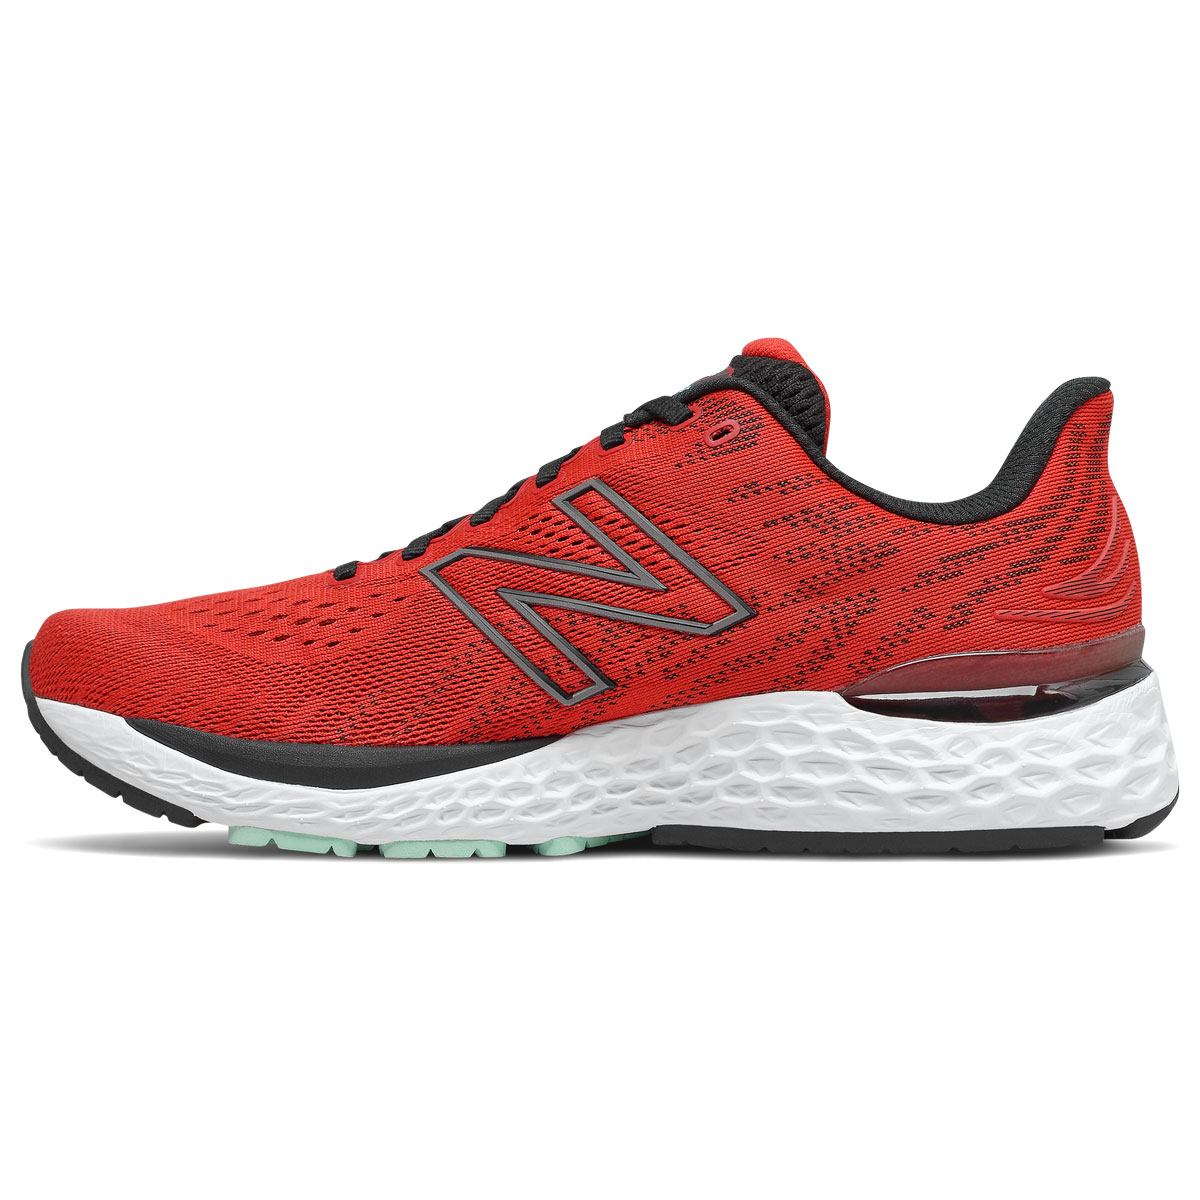 Men's New Balance Fresh Foam 880v11 Running Shoe - Color: Velocity Red/Black - Size: 8 - Width: Wide, Velocity Red/Black, large, image 2